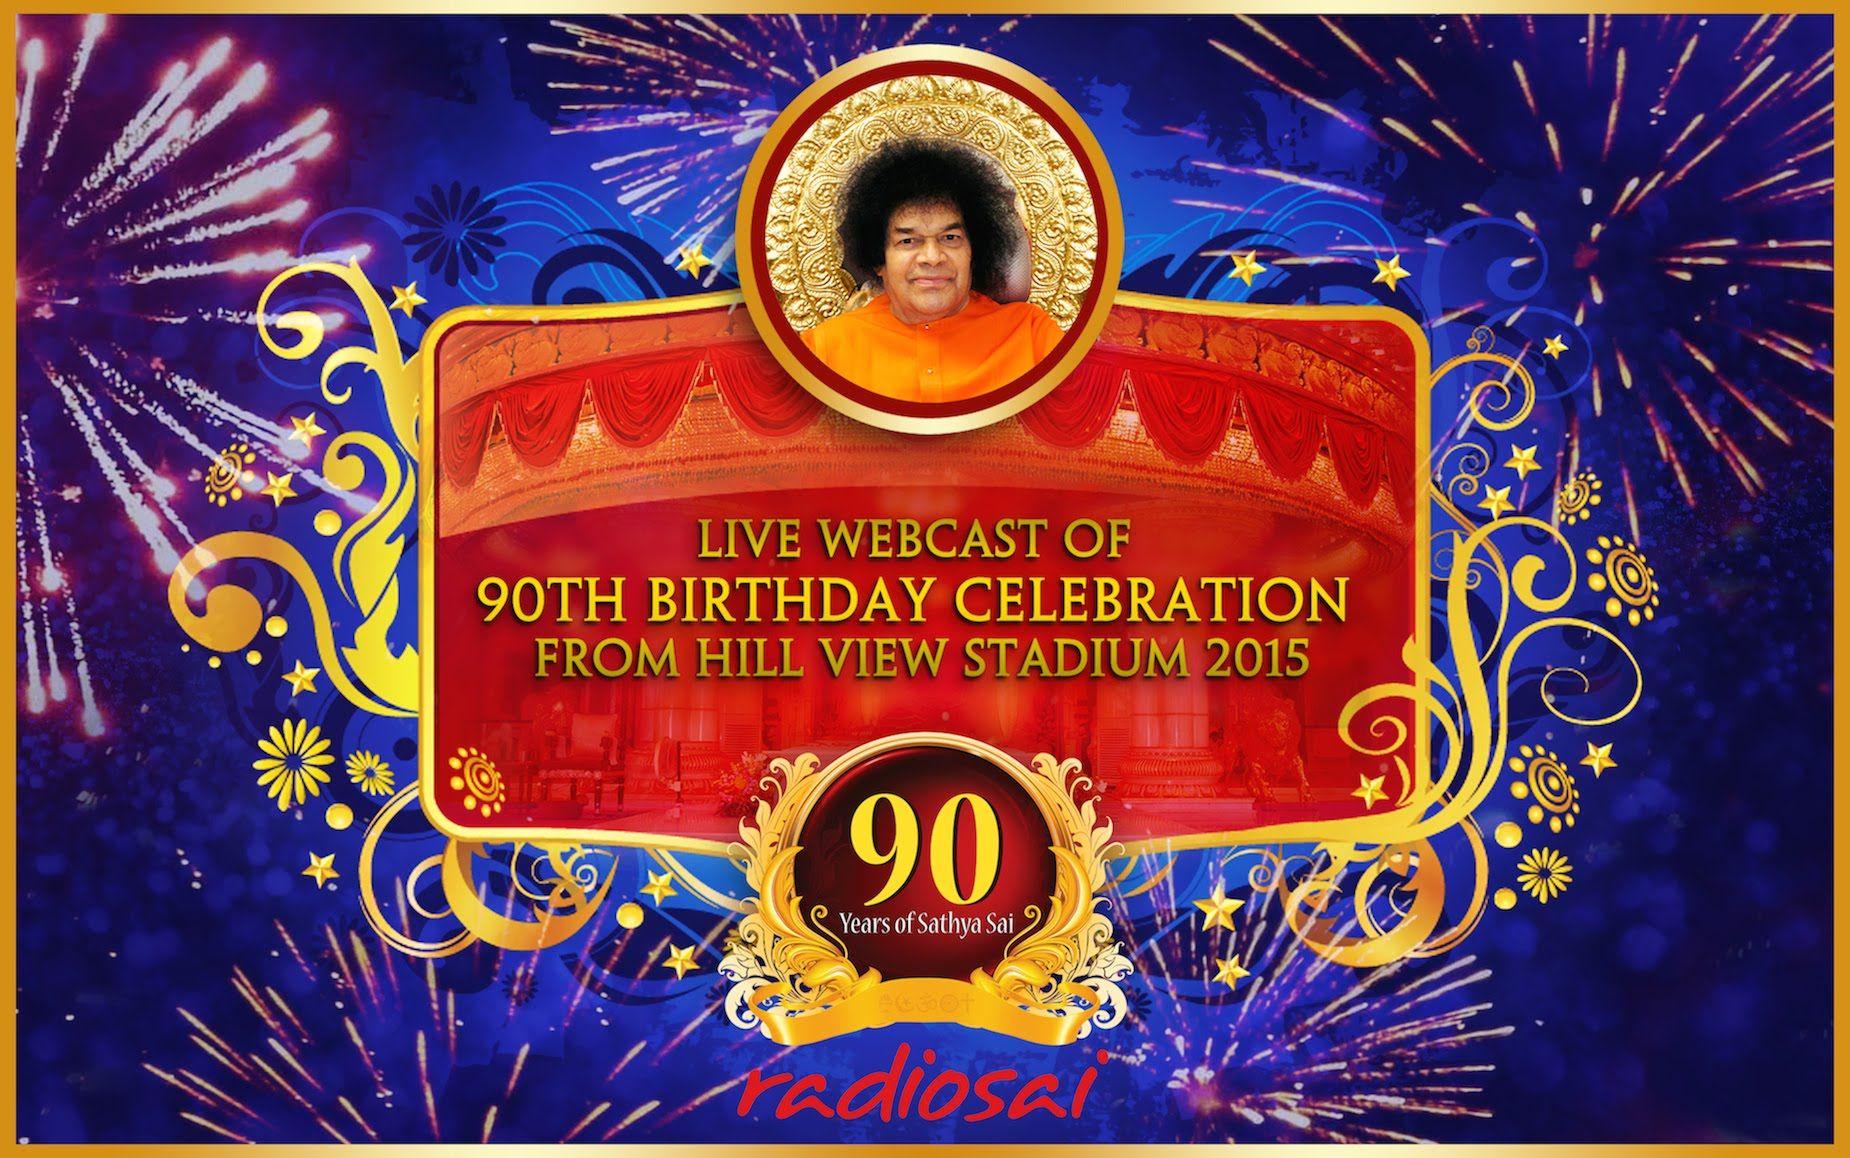 90th Birthday Celebrations Morning Hill View Stadium